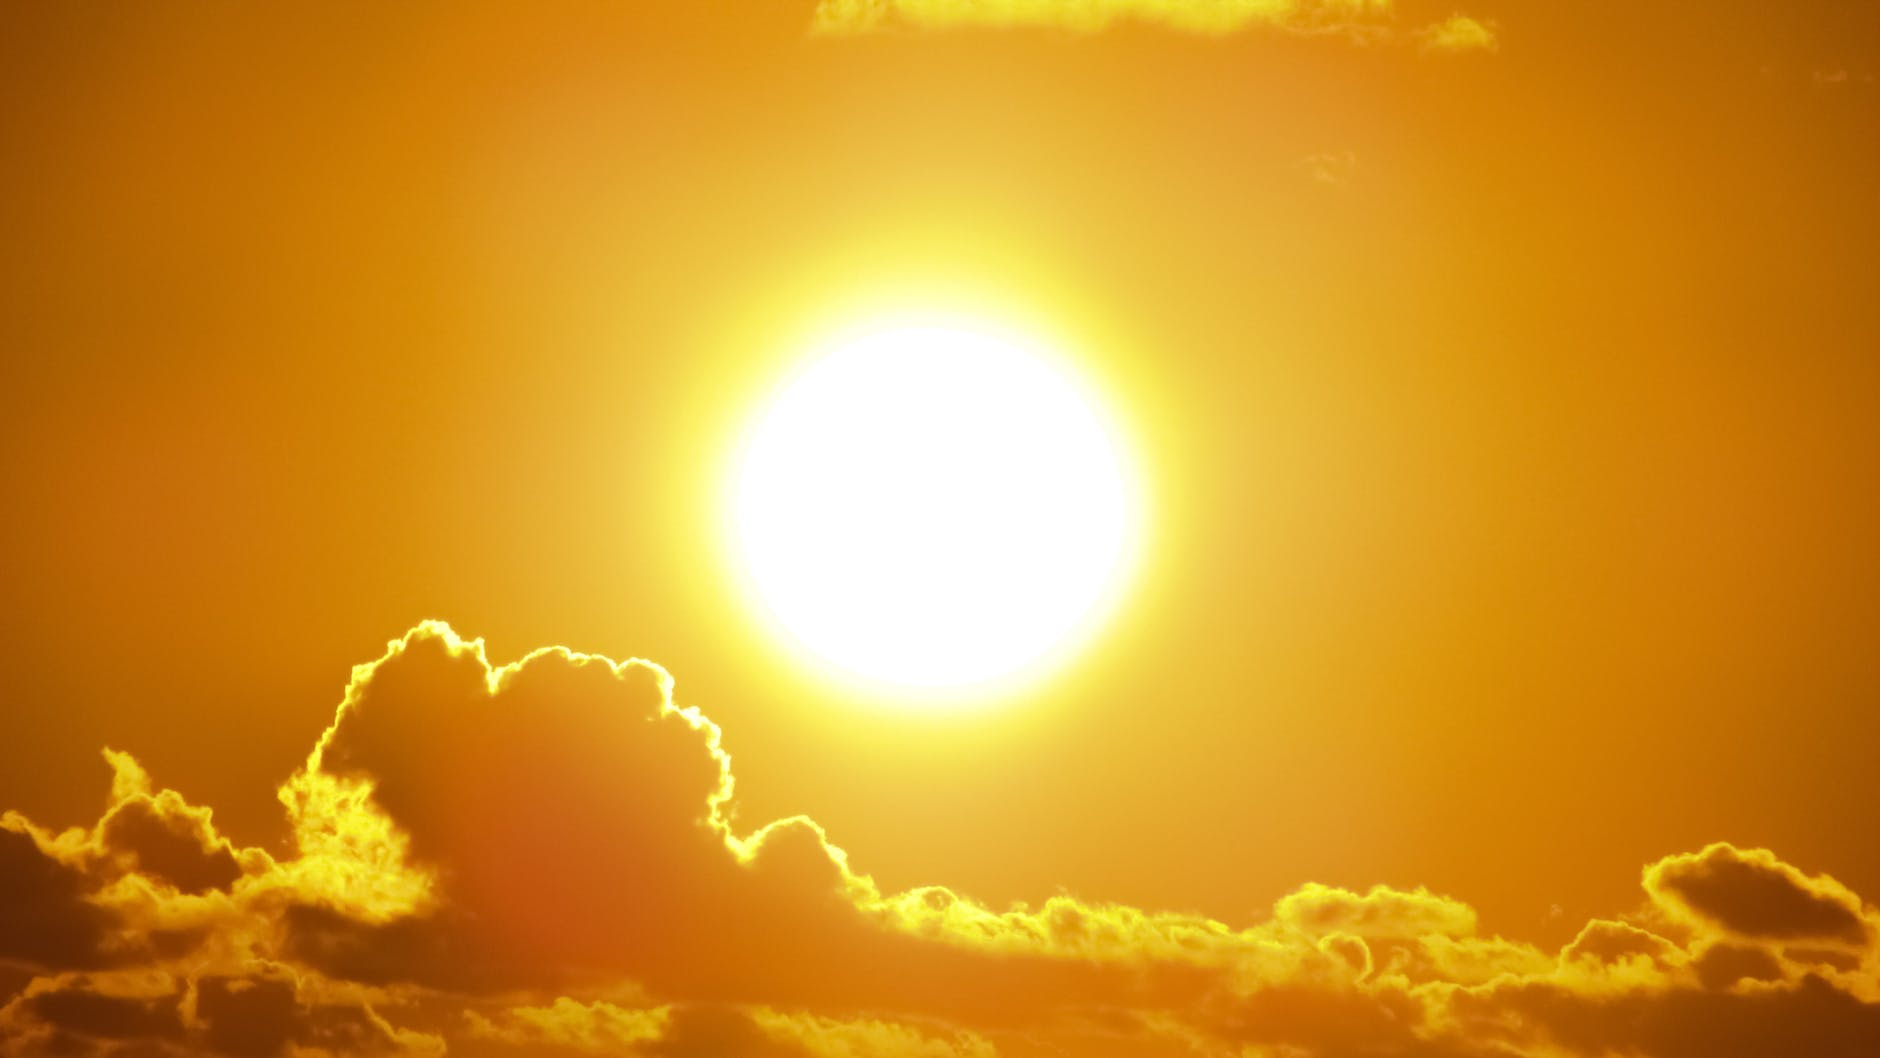 photography of a sun